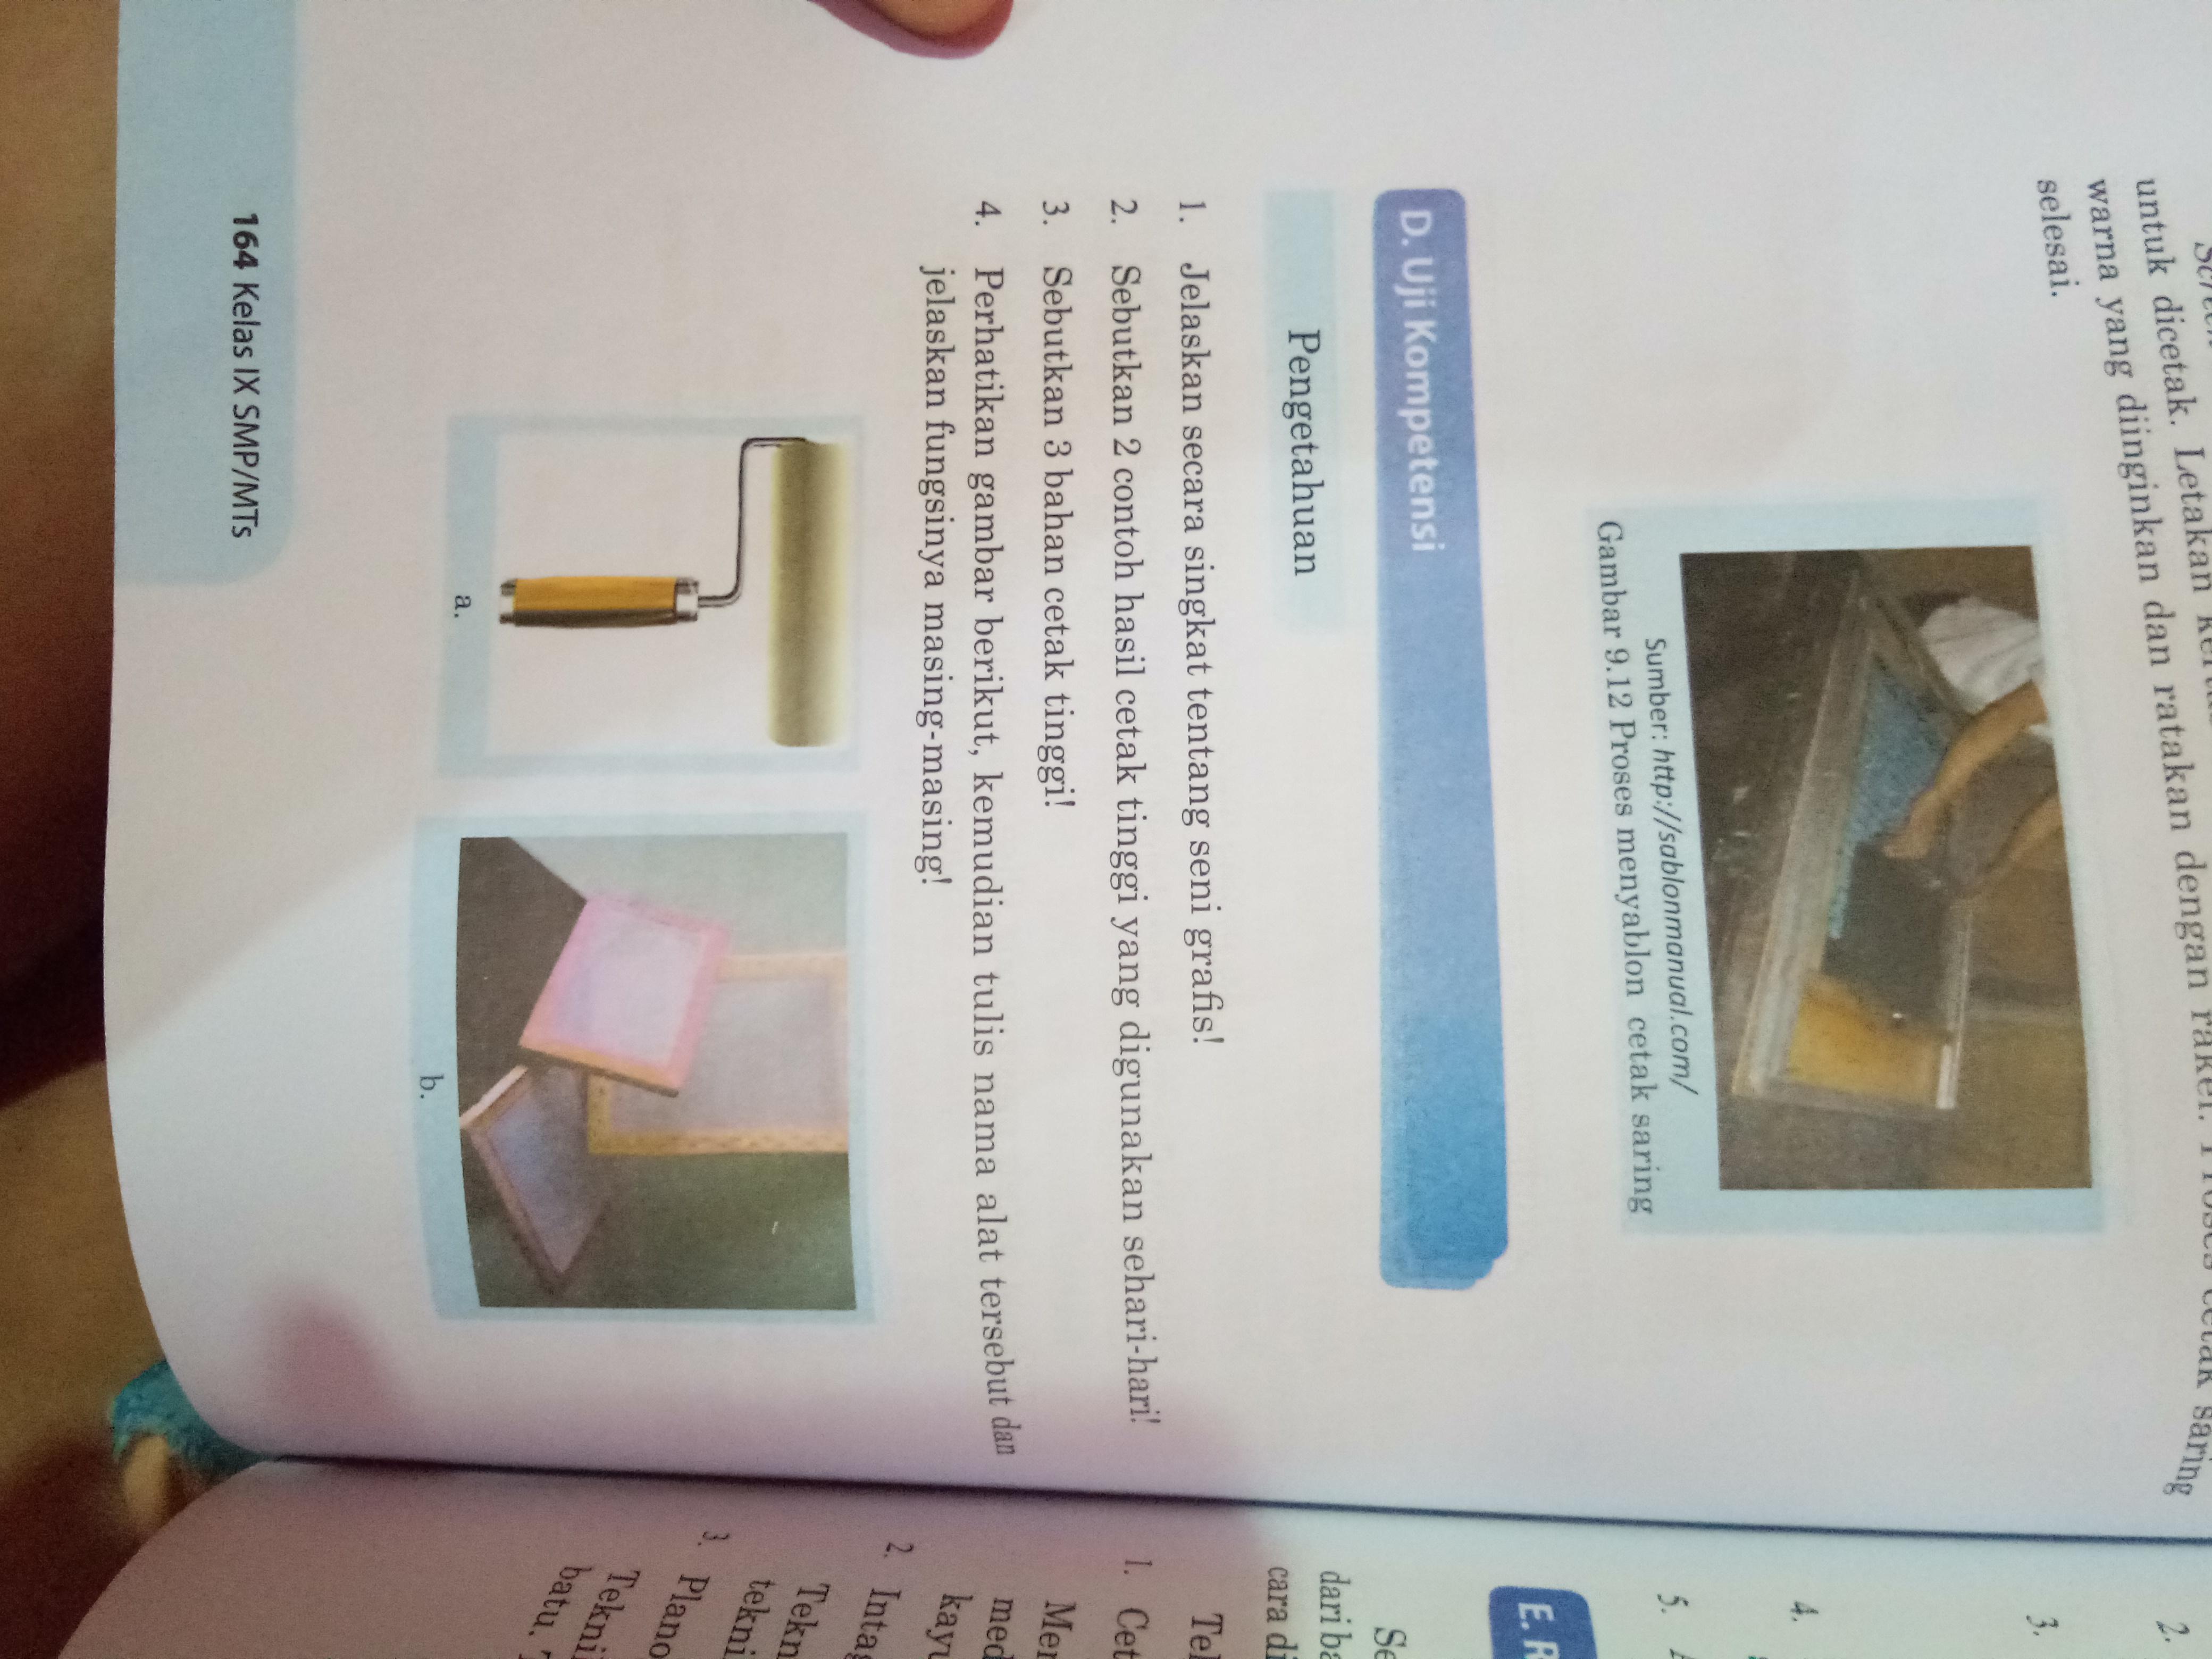 Sebutkan 3 Bahan Cetak Grafis : sebutkan, bahan, cetak, grafis, Jawab, Pleaseeeee, Kakk: